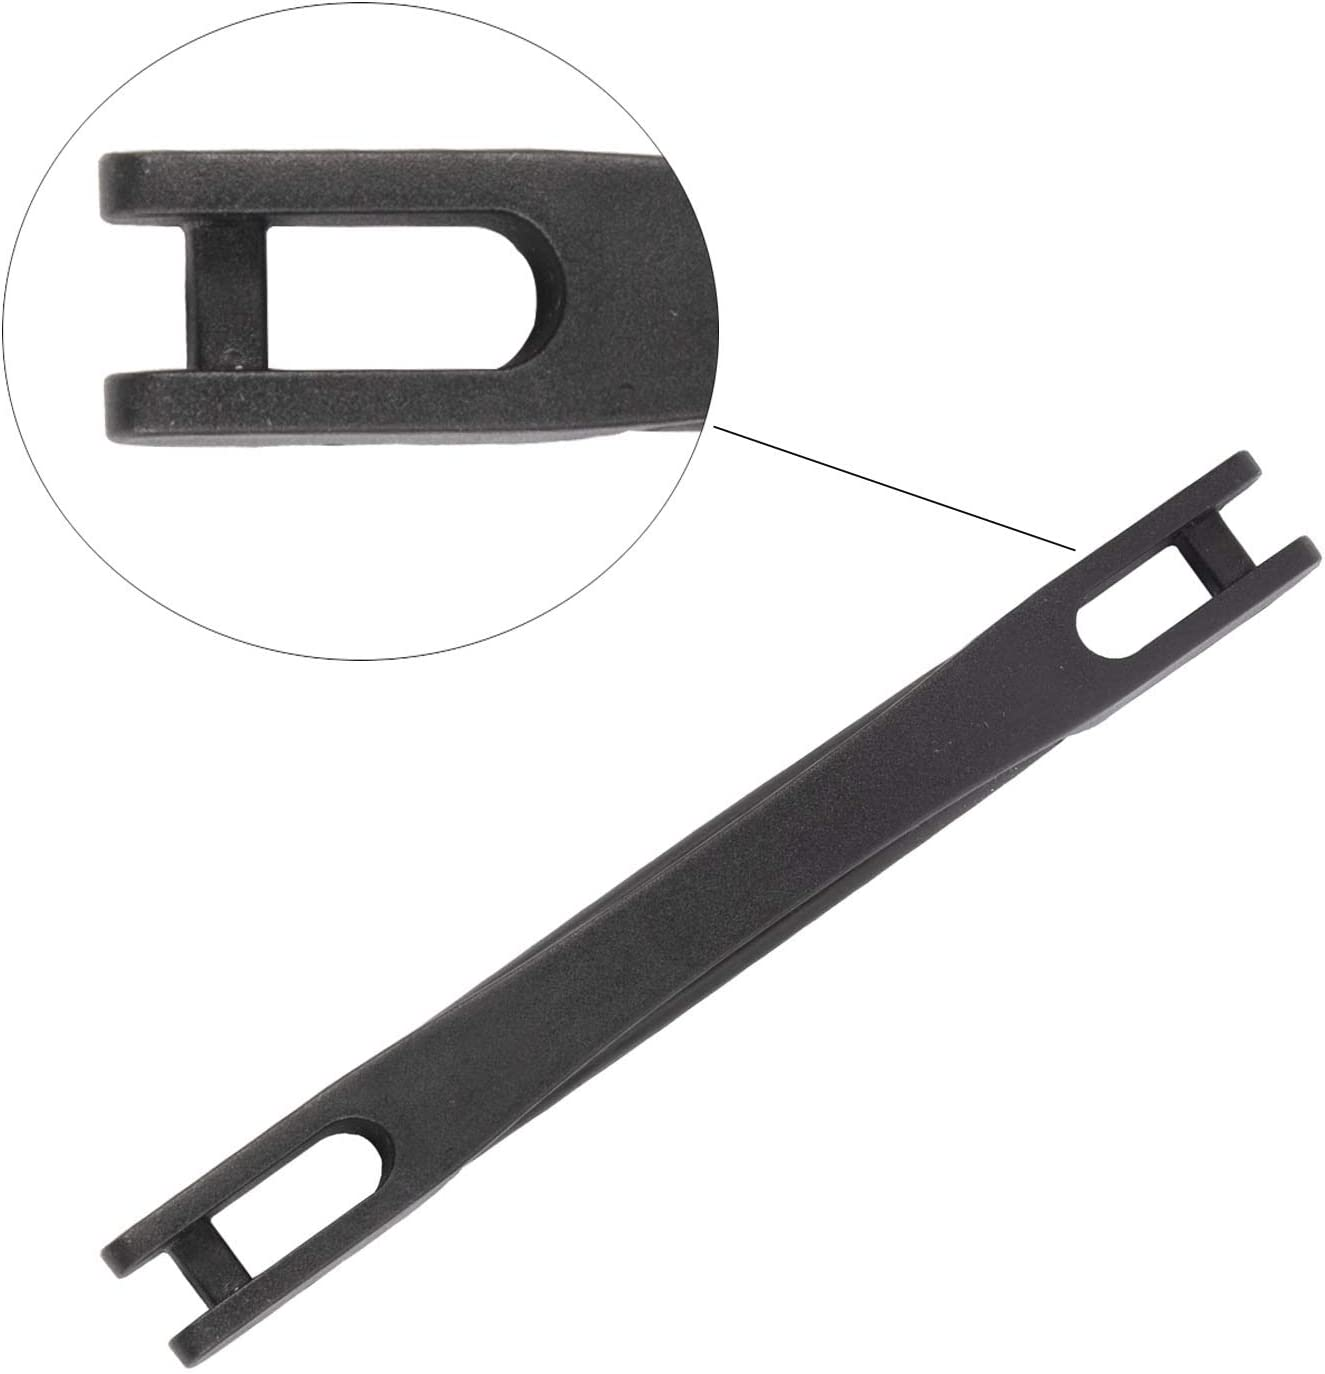 22.5cm Length Suitcase Luggage Case Handle 2PCS Black Luggage Strap Handle Grip for Suitcase Luggage